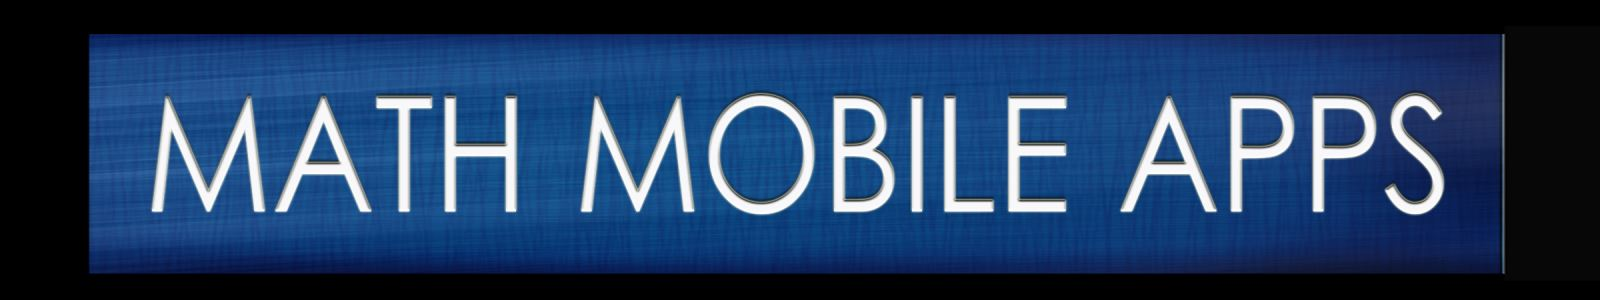 math mobile apps header